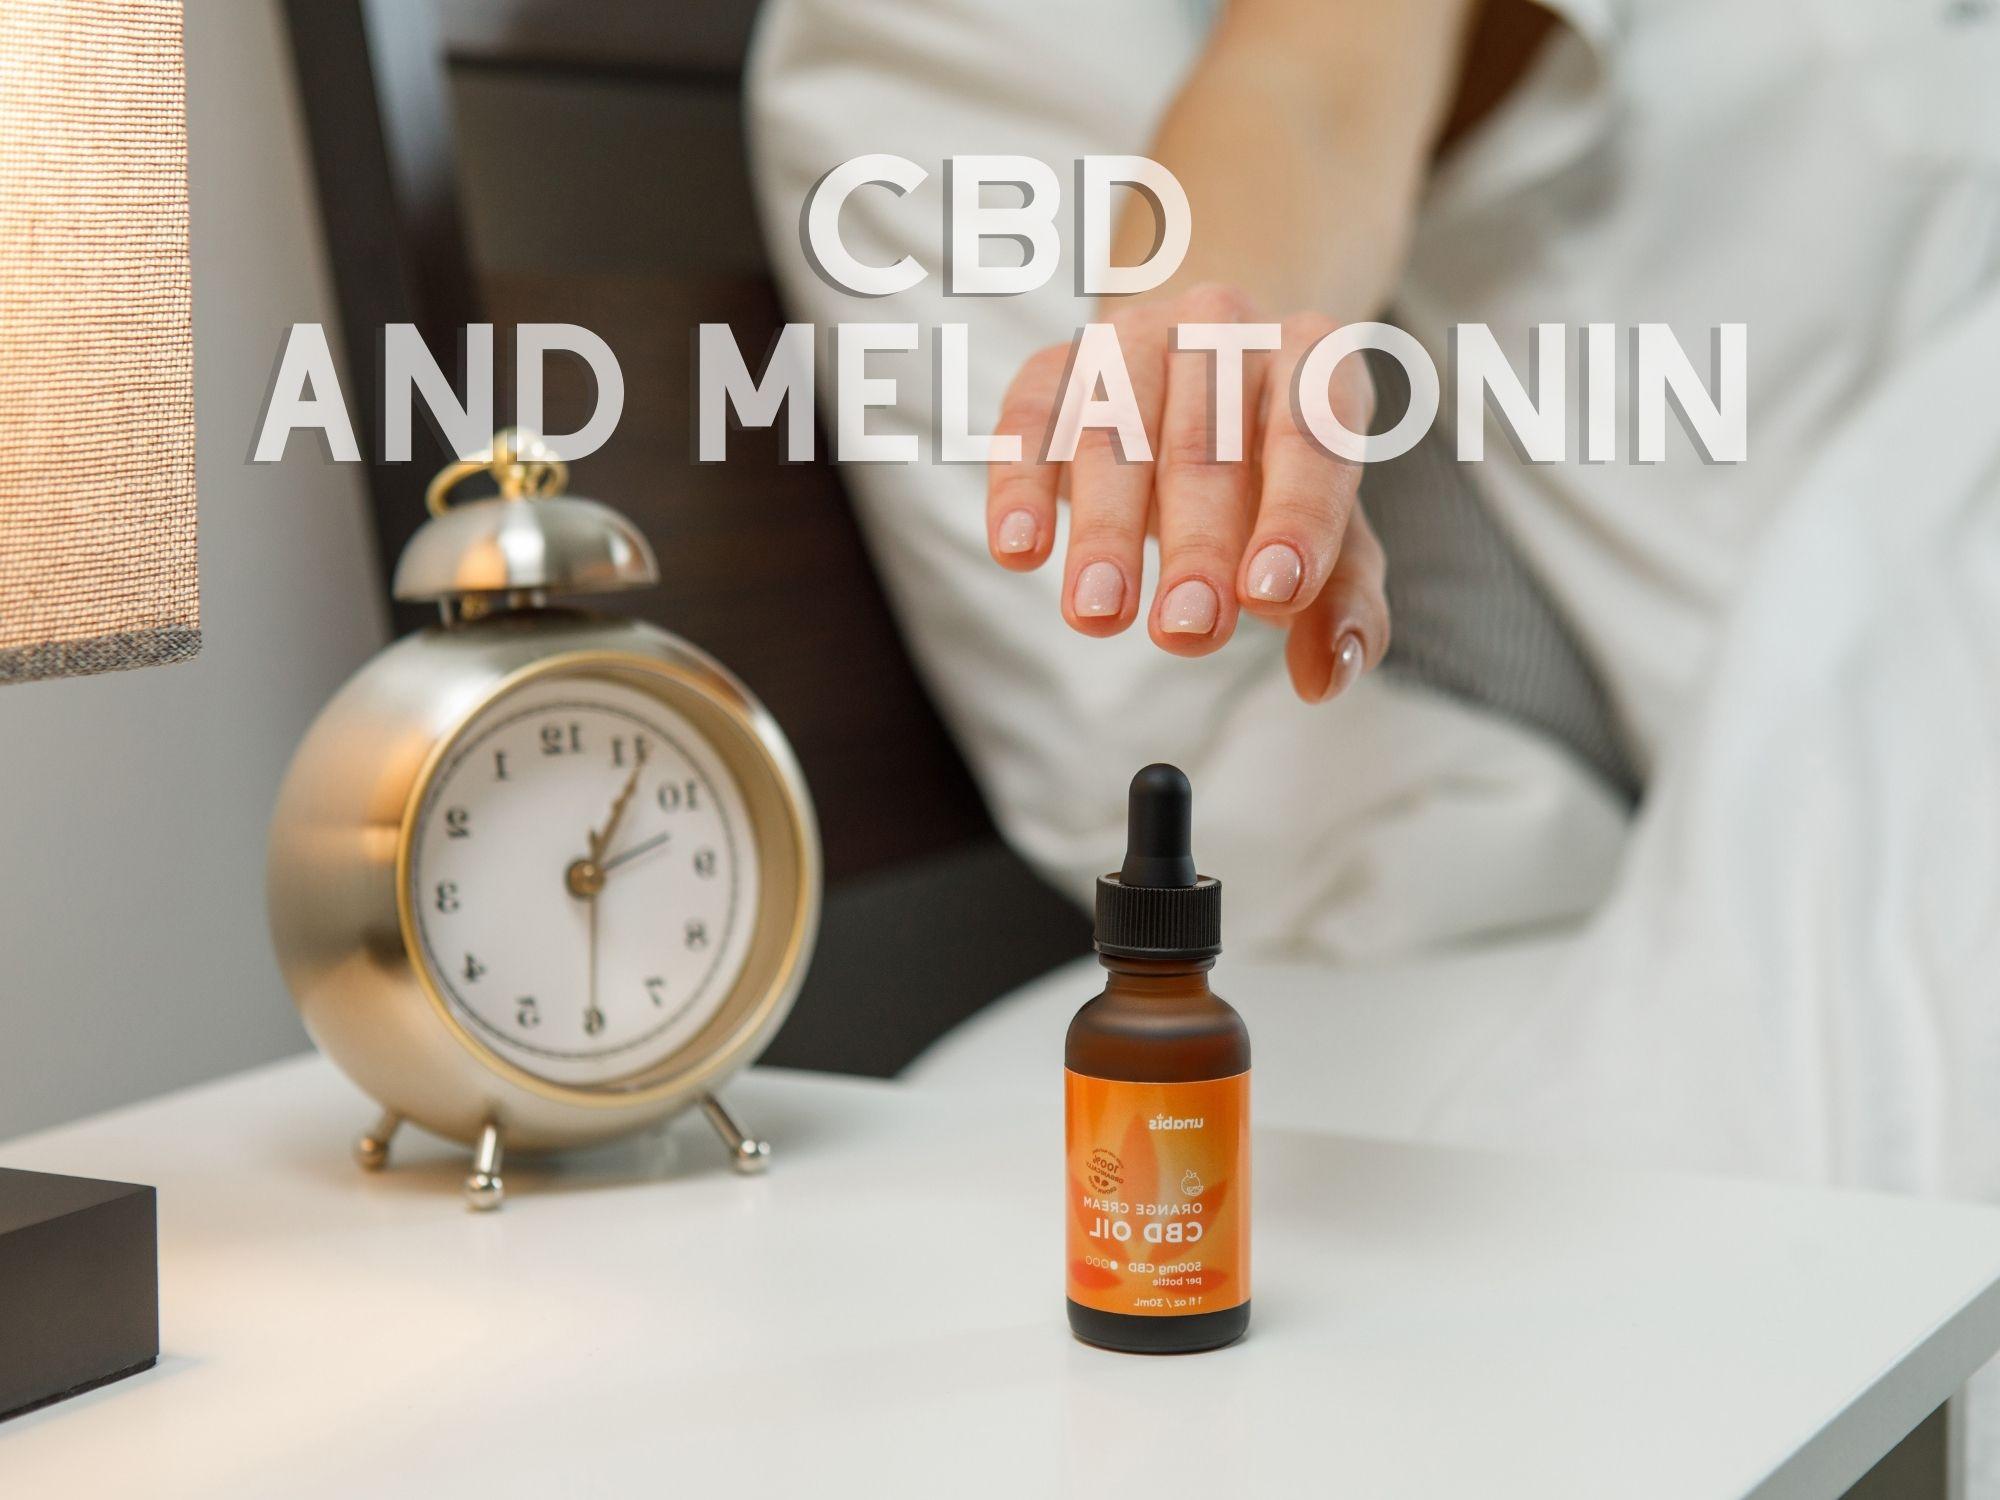 CBD and melatonin